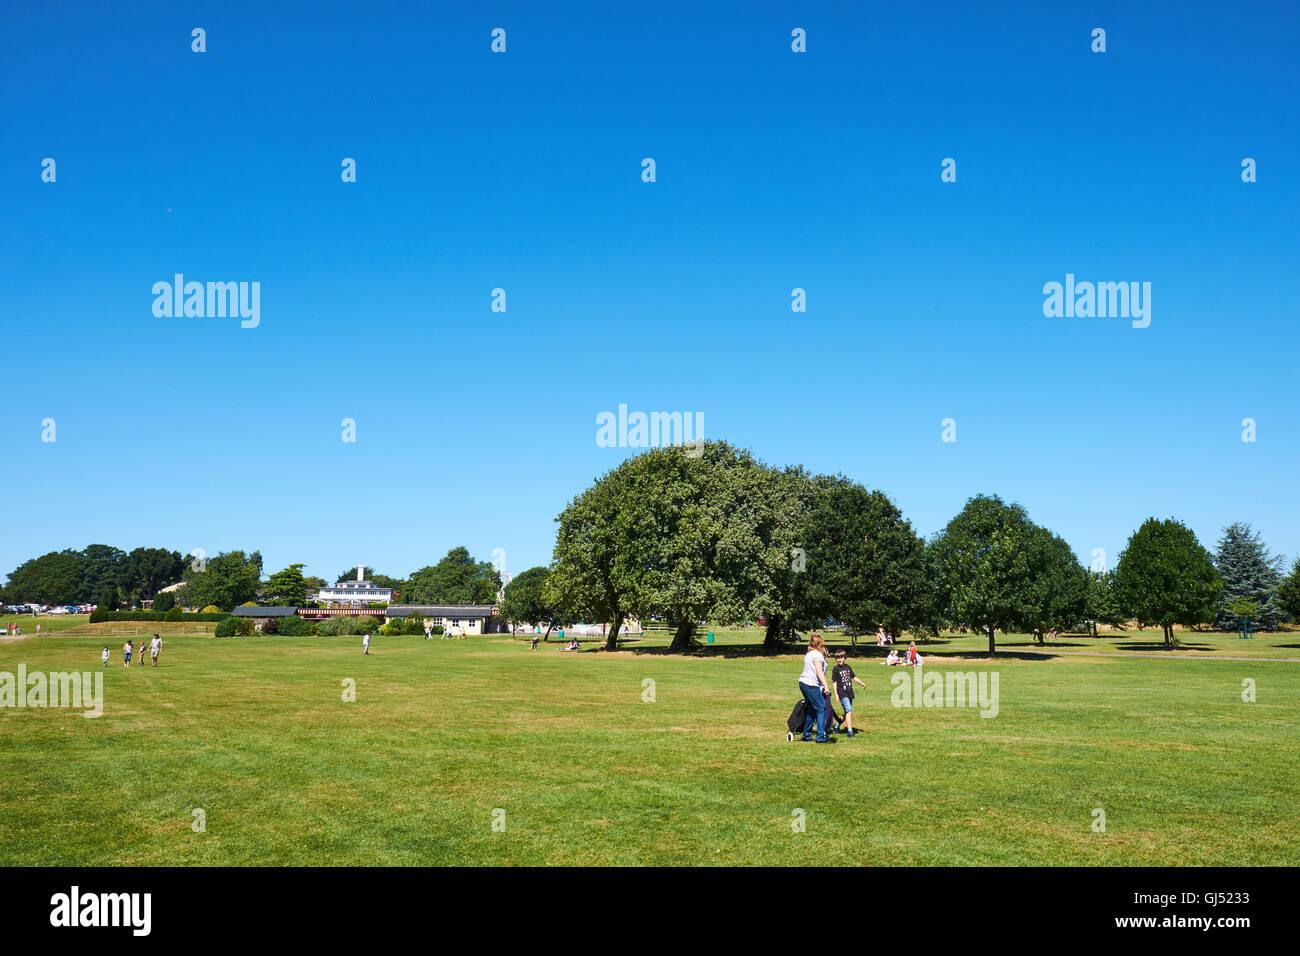 Wicksteed Park Kettering Northamptonshire UK - Stock Image